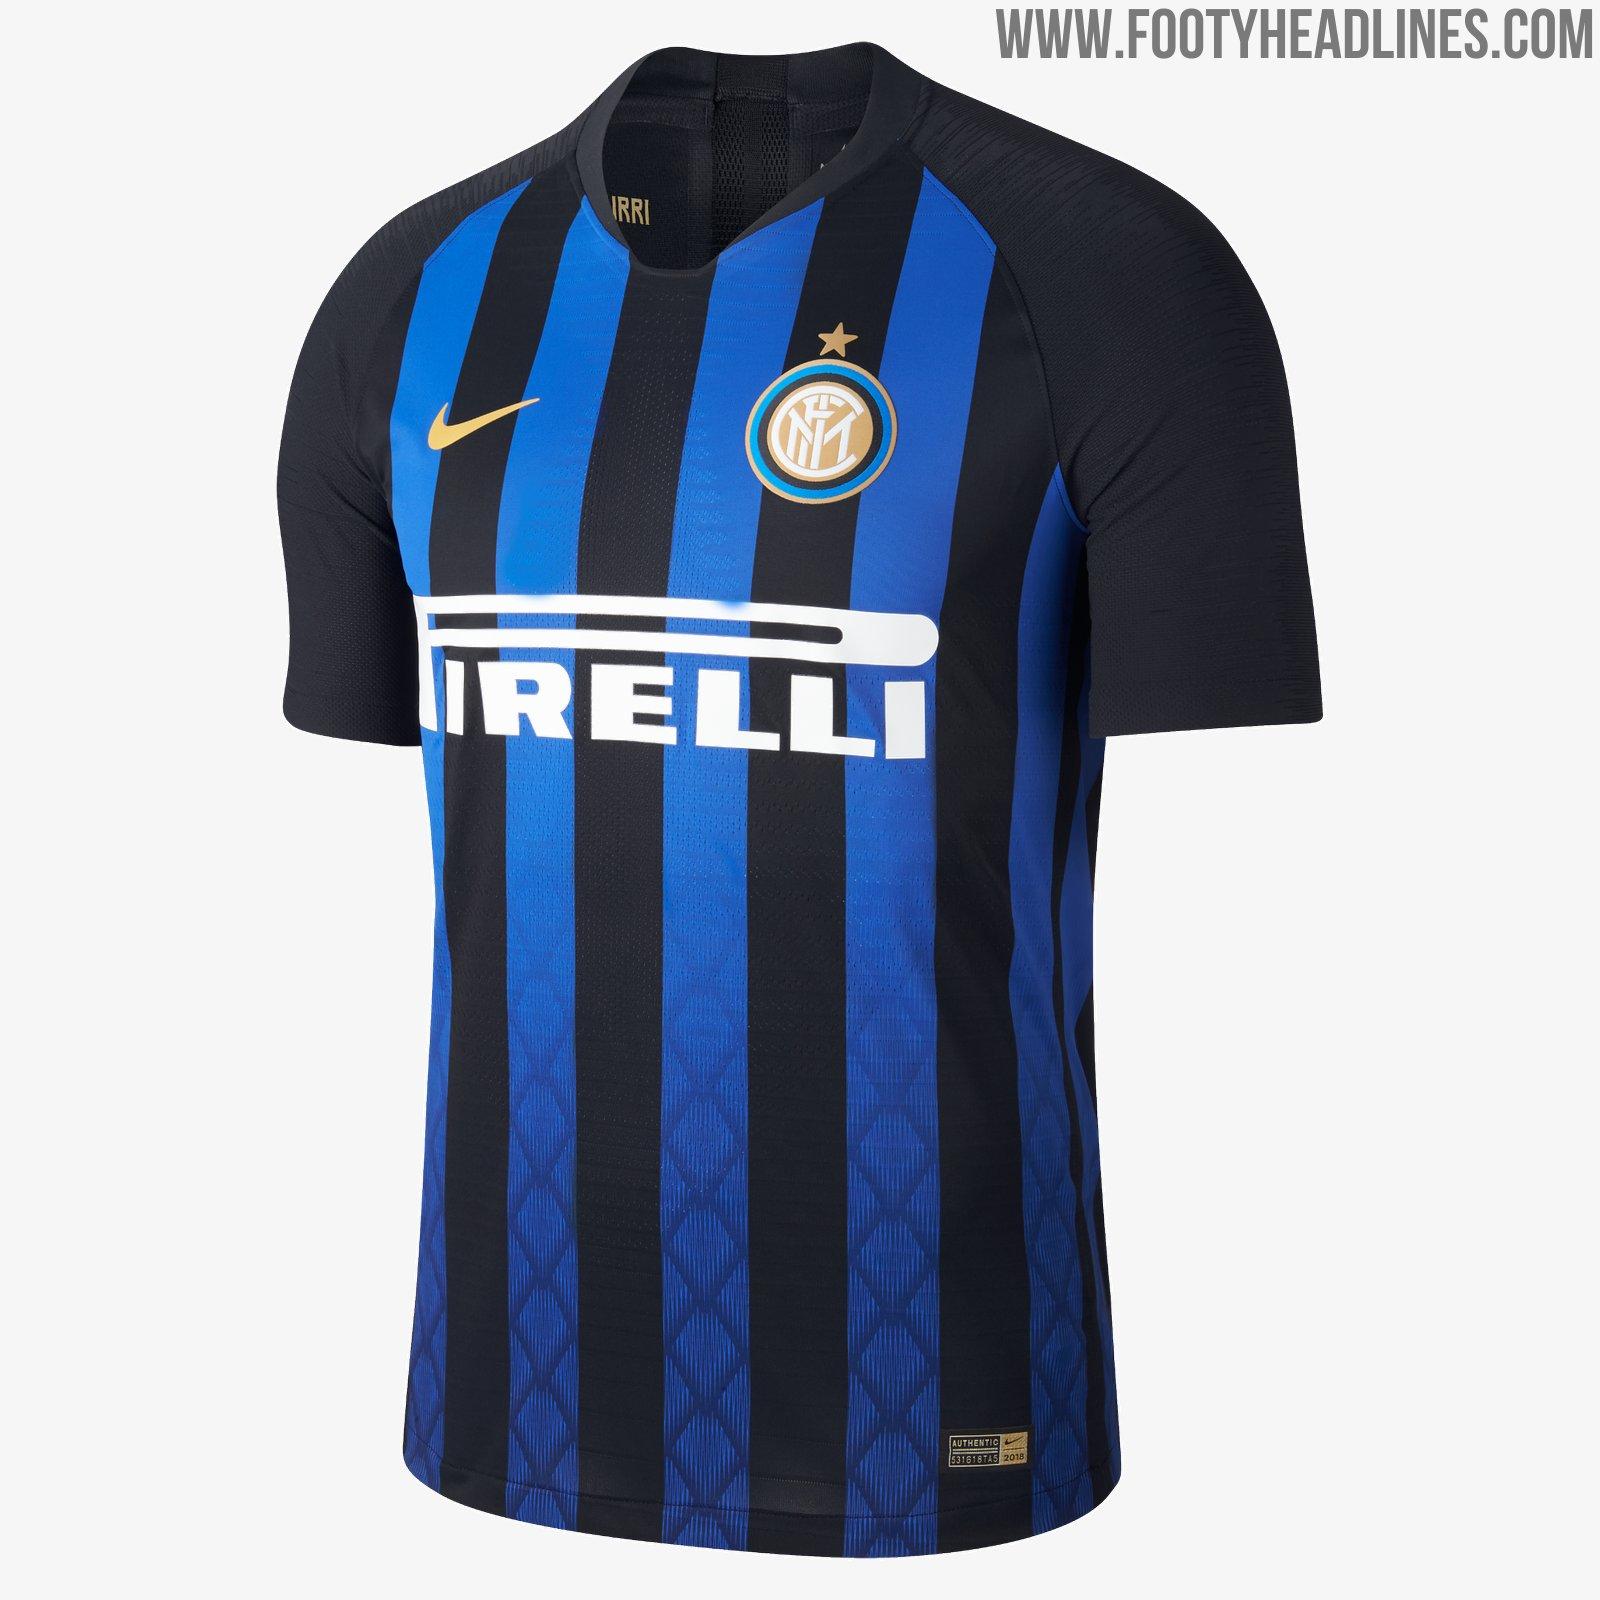 Barcelona Chelsea Manchester City Psg Atletico Inter Roma Galatasaray Zenit Nike 18 19